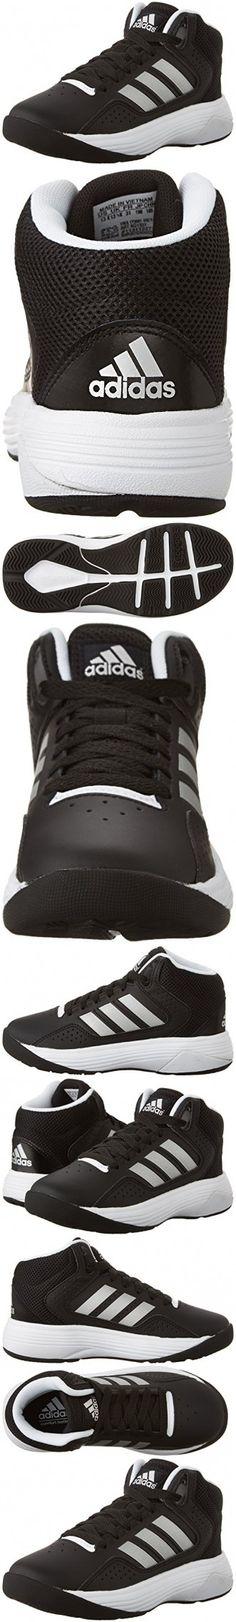 Adidas originali boys' stan smith j pattinare scarpa, bianco / bianco / verde, 5